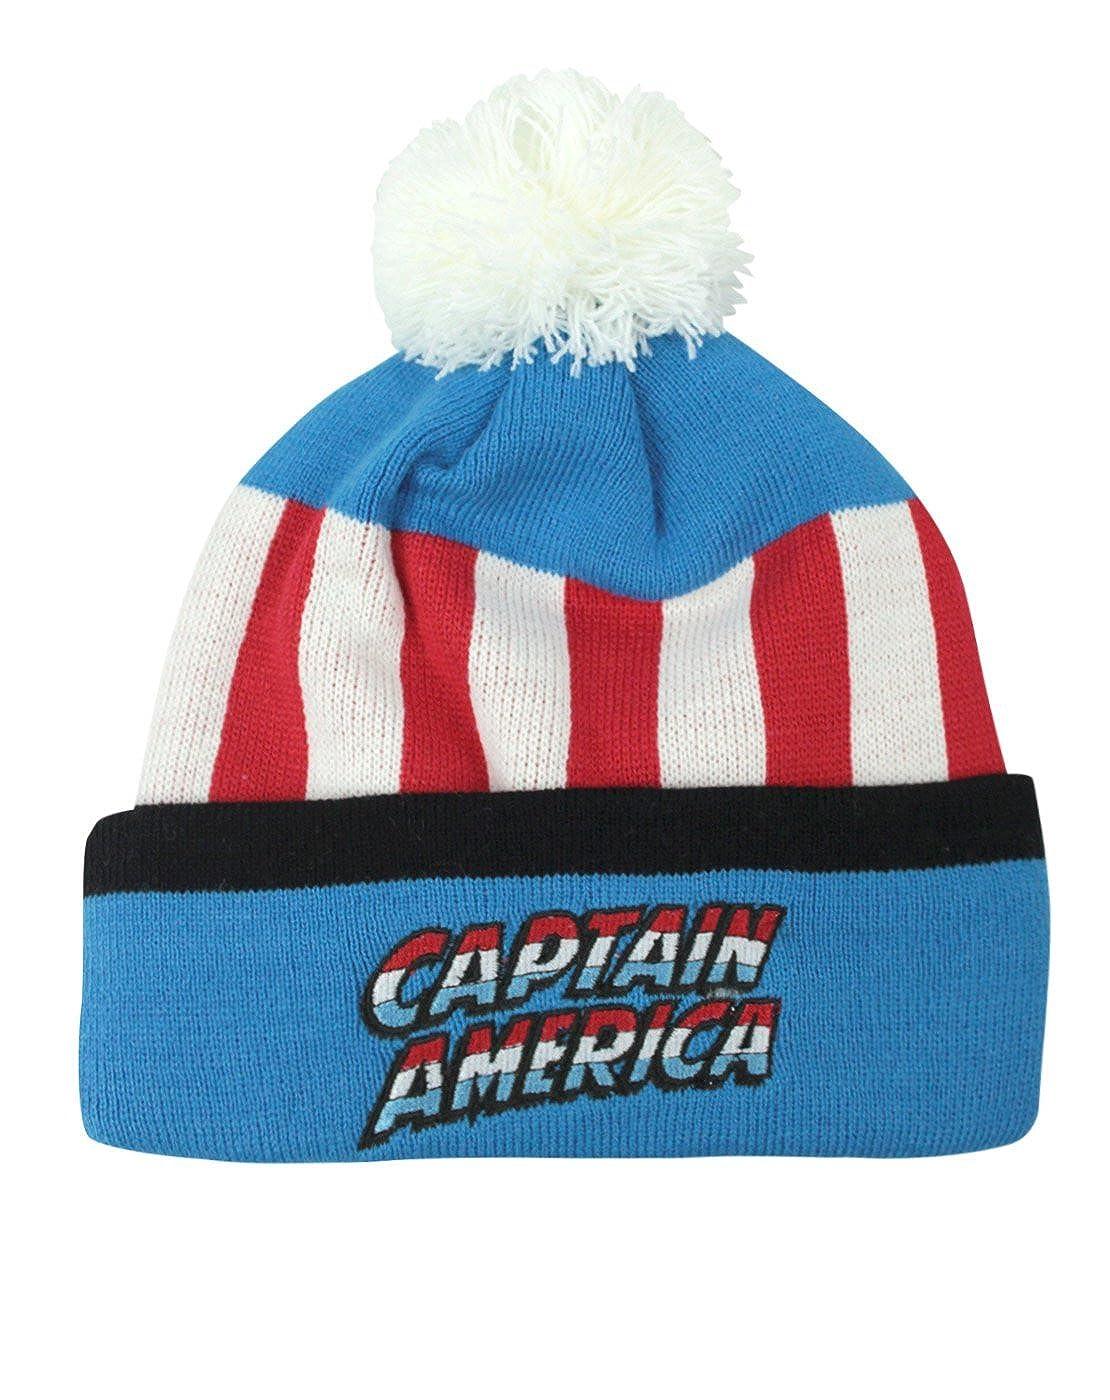 Official Captain America Retro Original Kids Bobble Hat